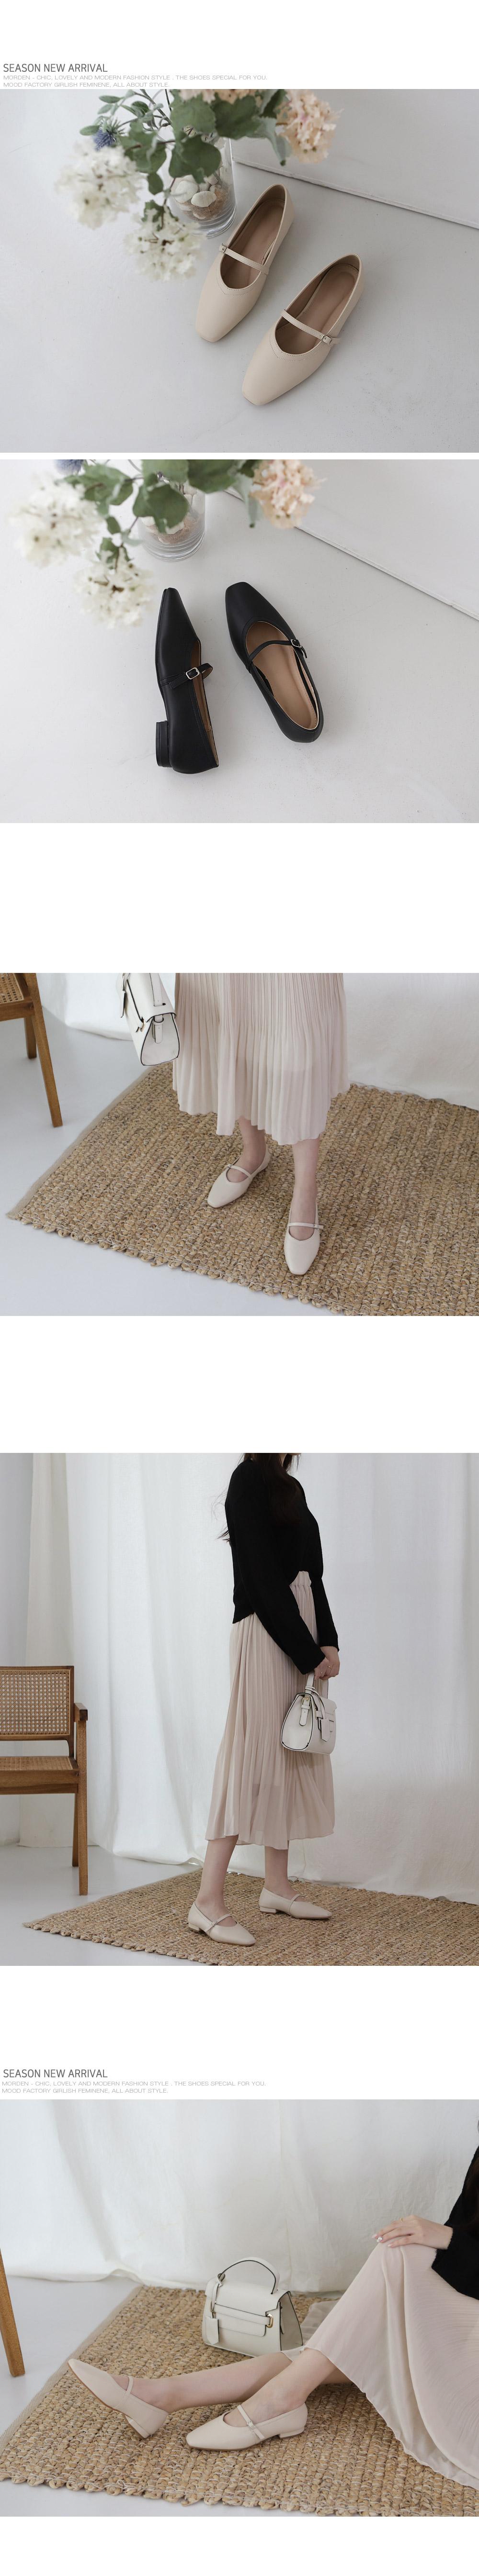 [Handmade] Buckle Strap Ballet Flats-Holiholic